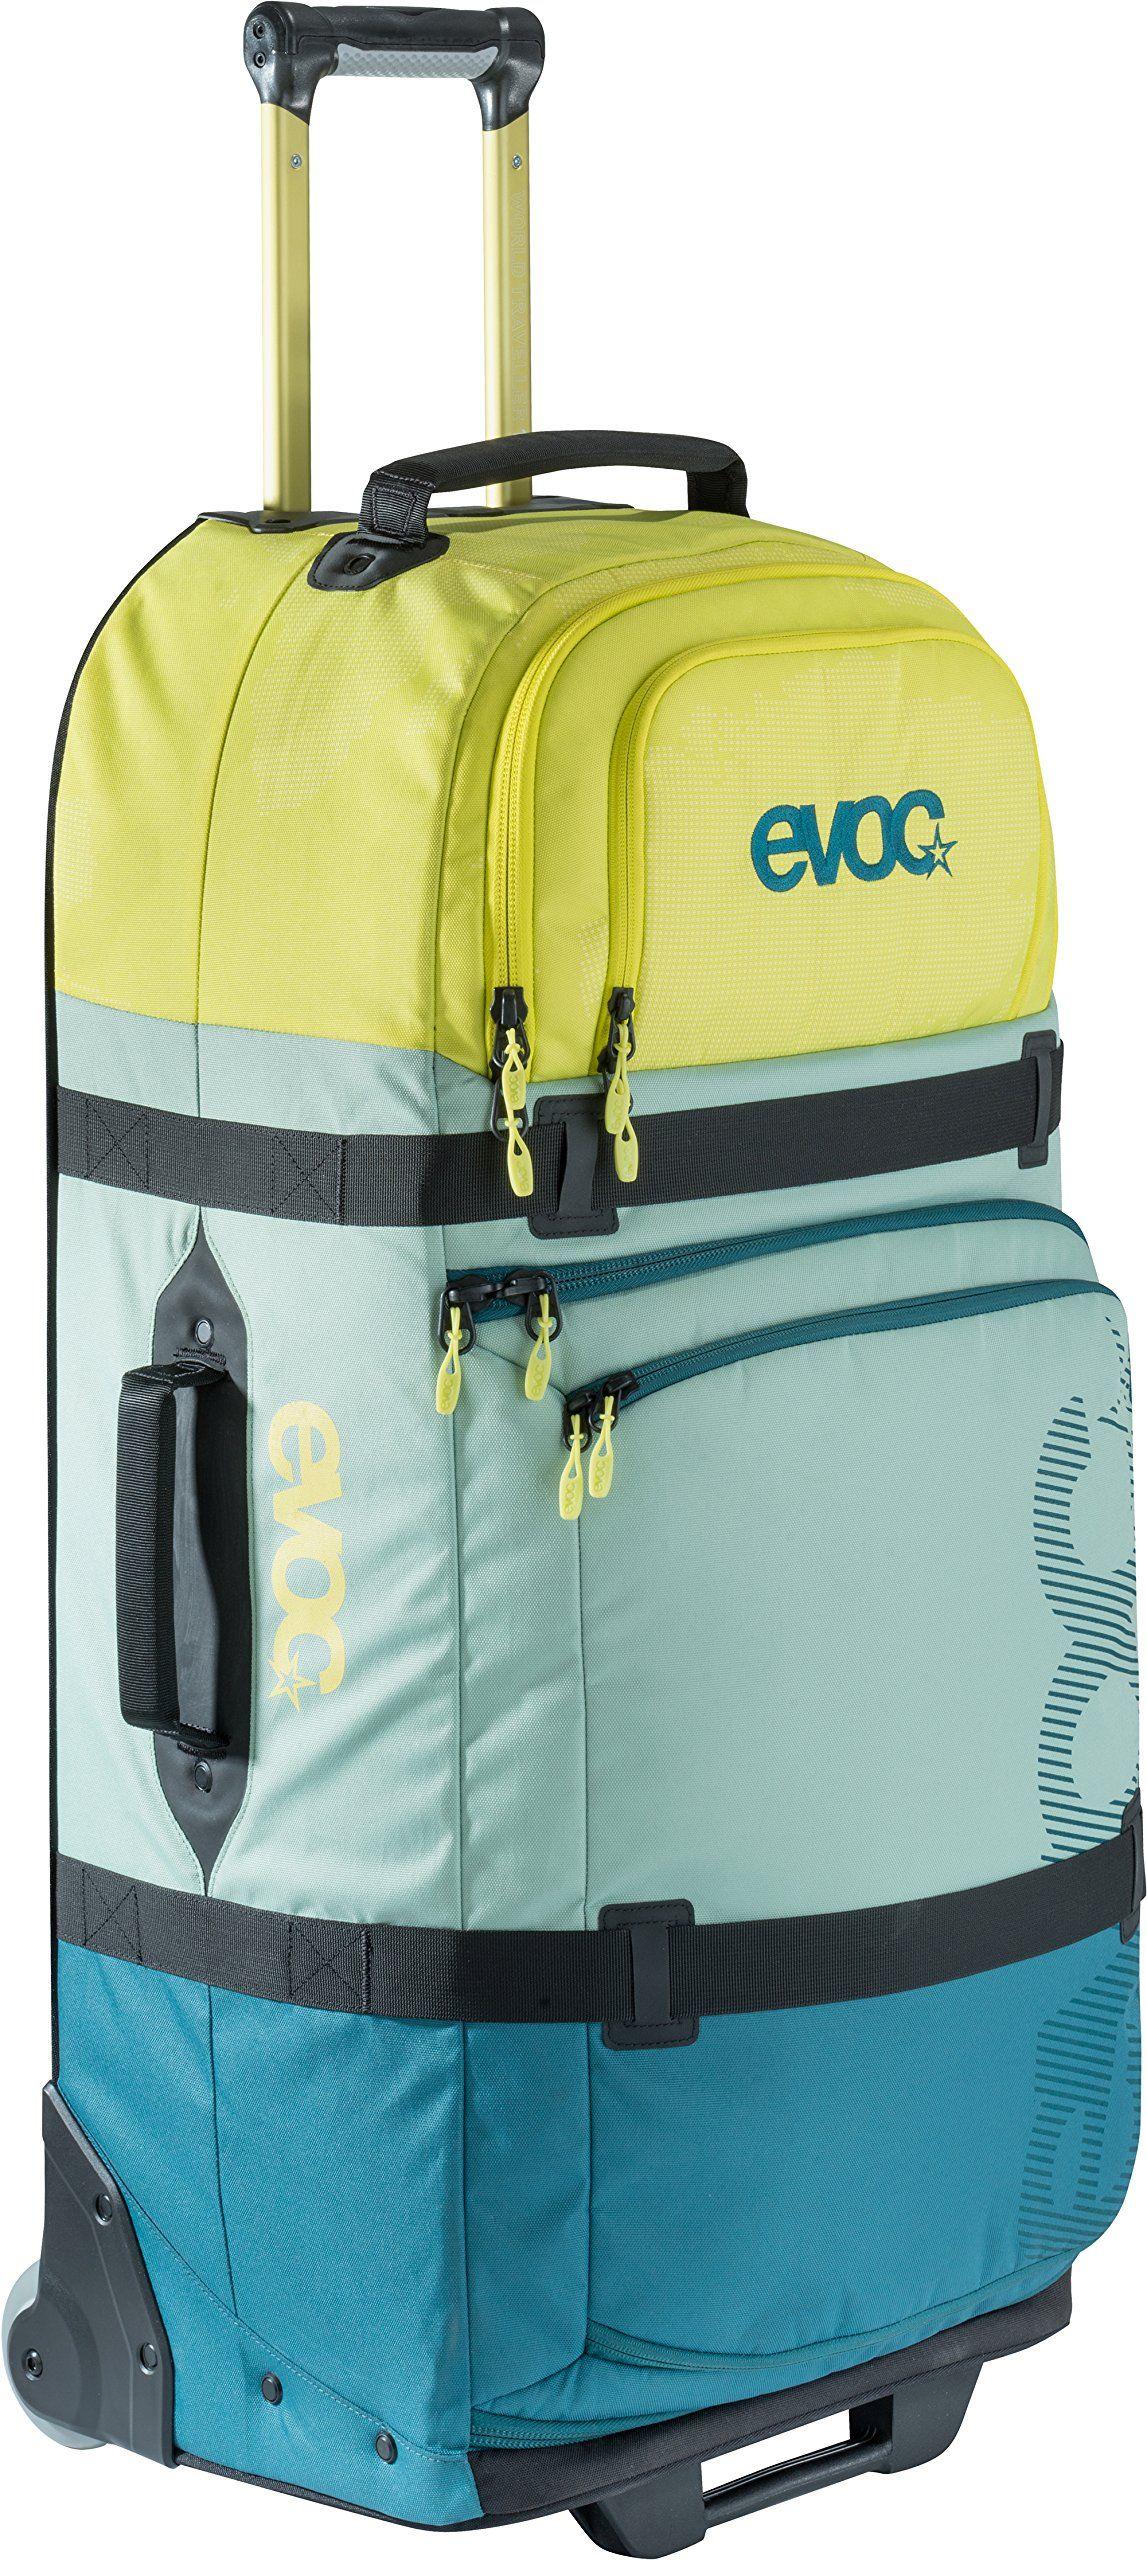 f93ad7f0853 Evoc World Traveller Suitcase - 7628cu in Multicolor